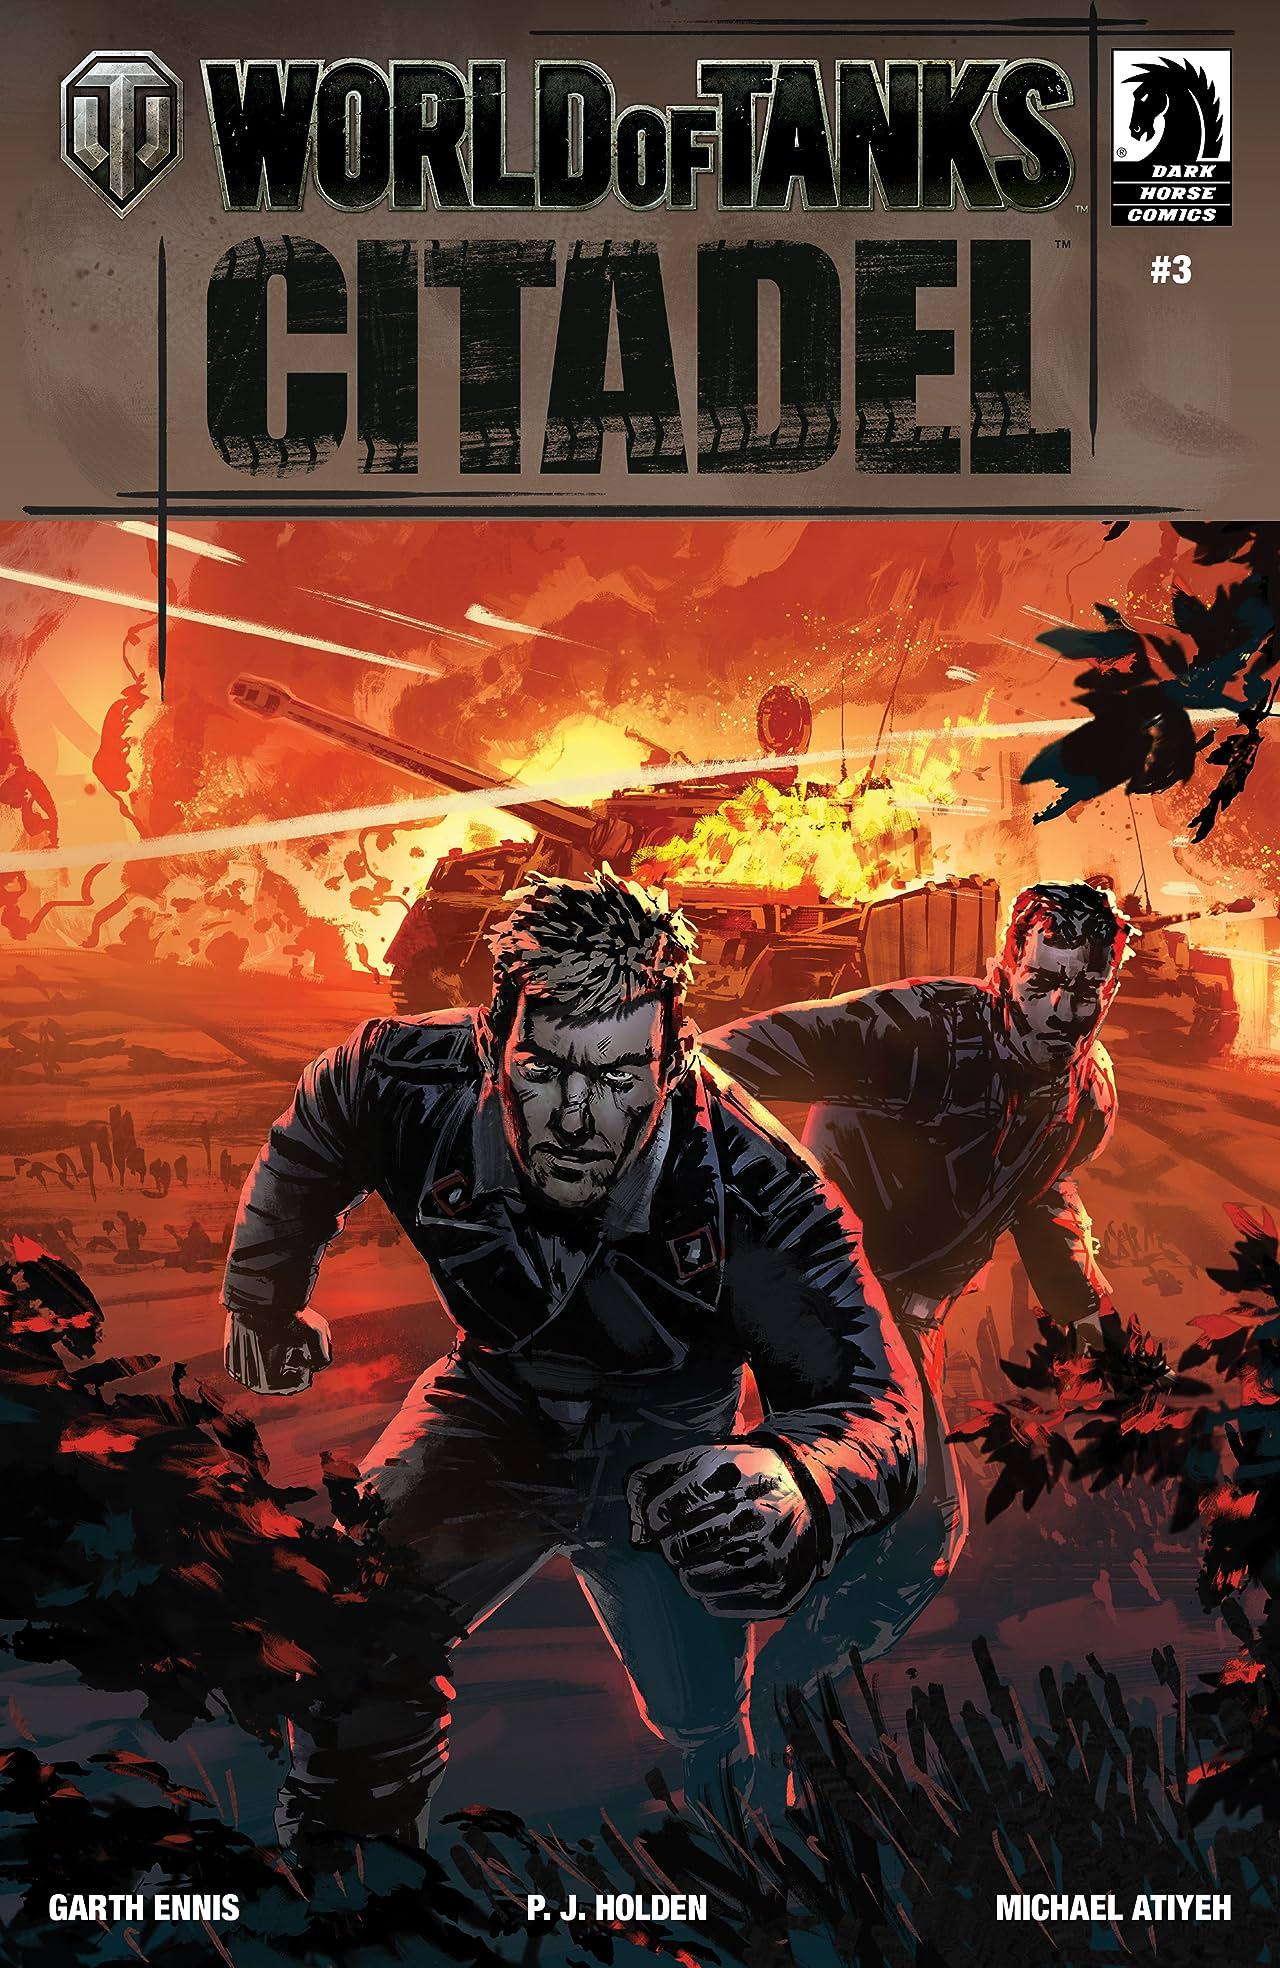 World of Tanks: Citadel #3